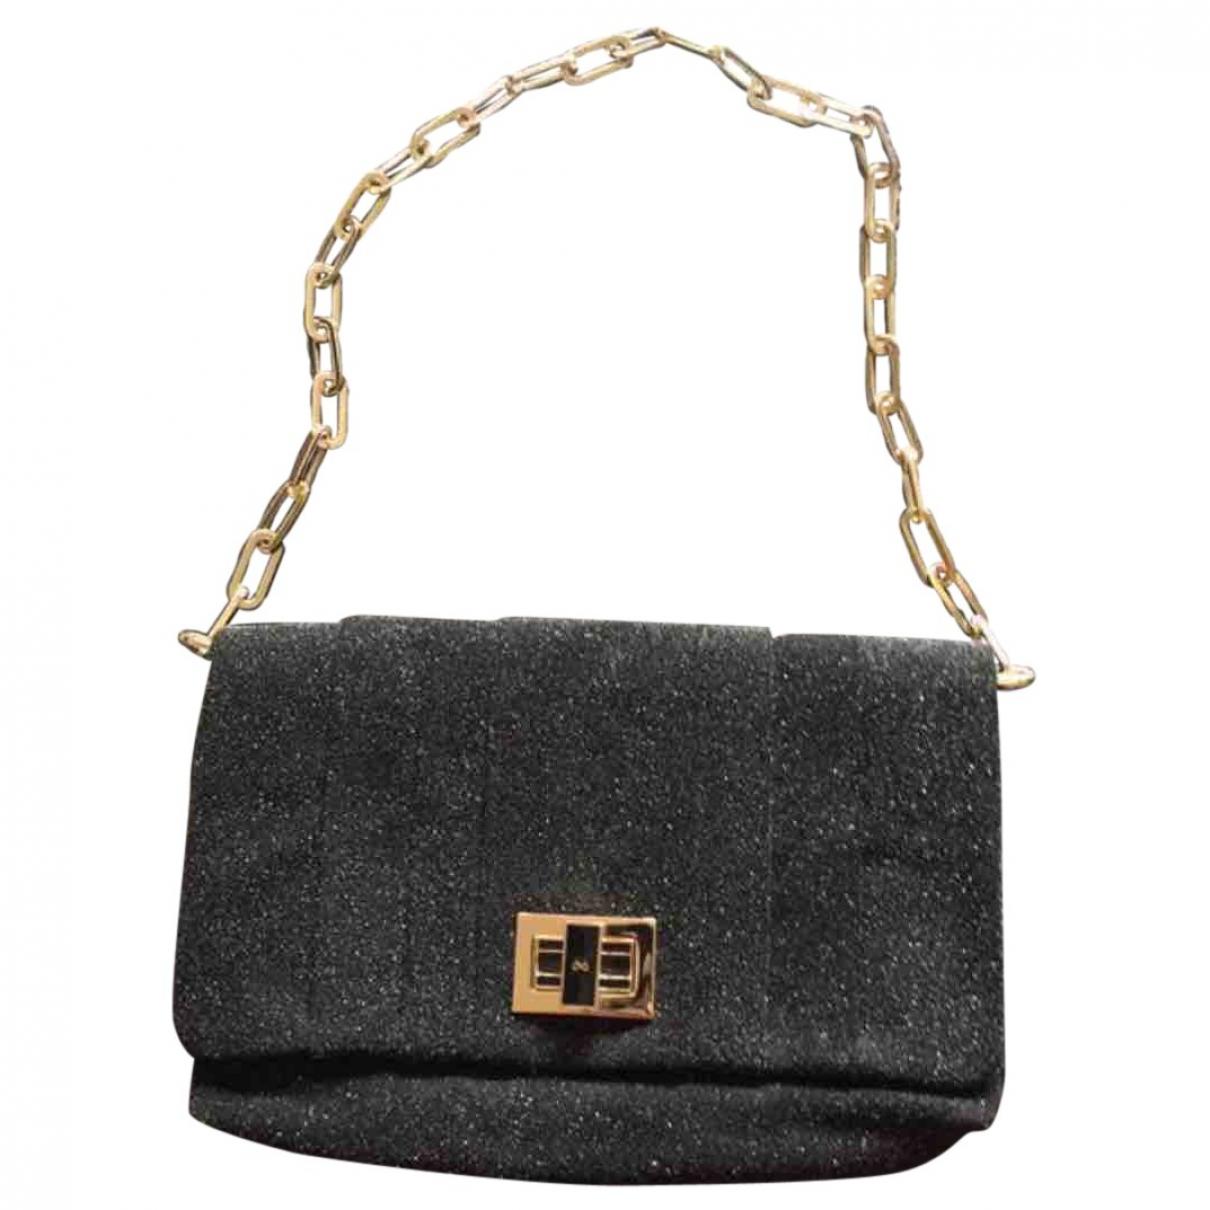 Anya Hindmarch \N Black Leather handbag for Women \N